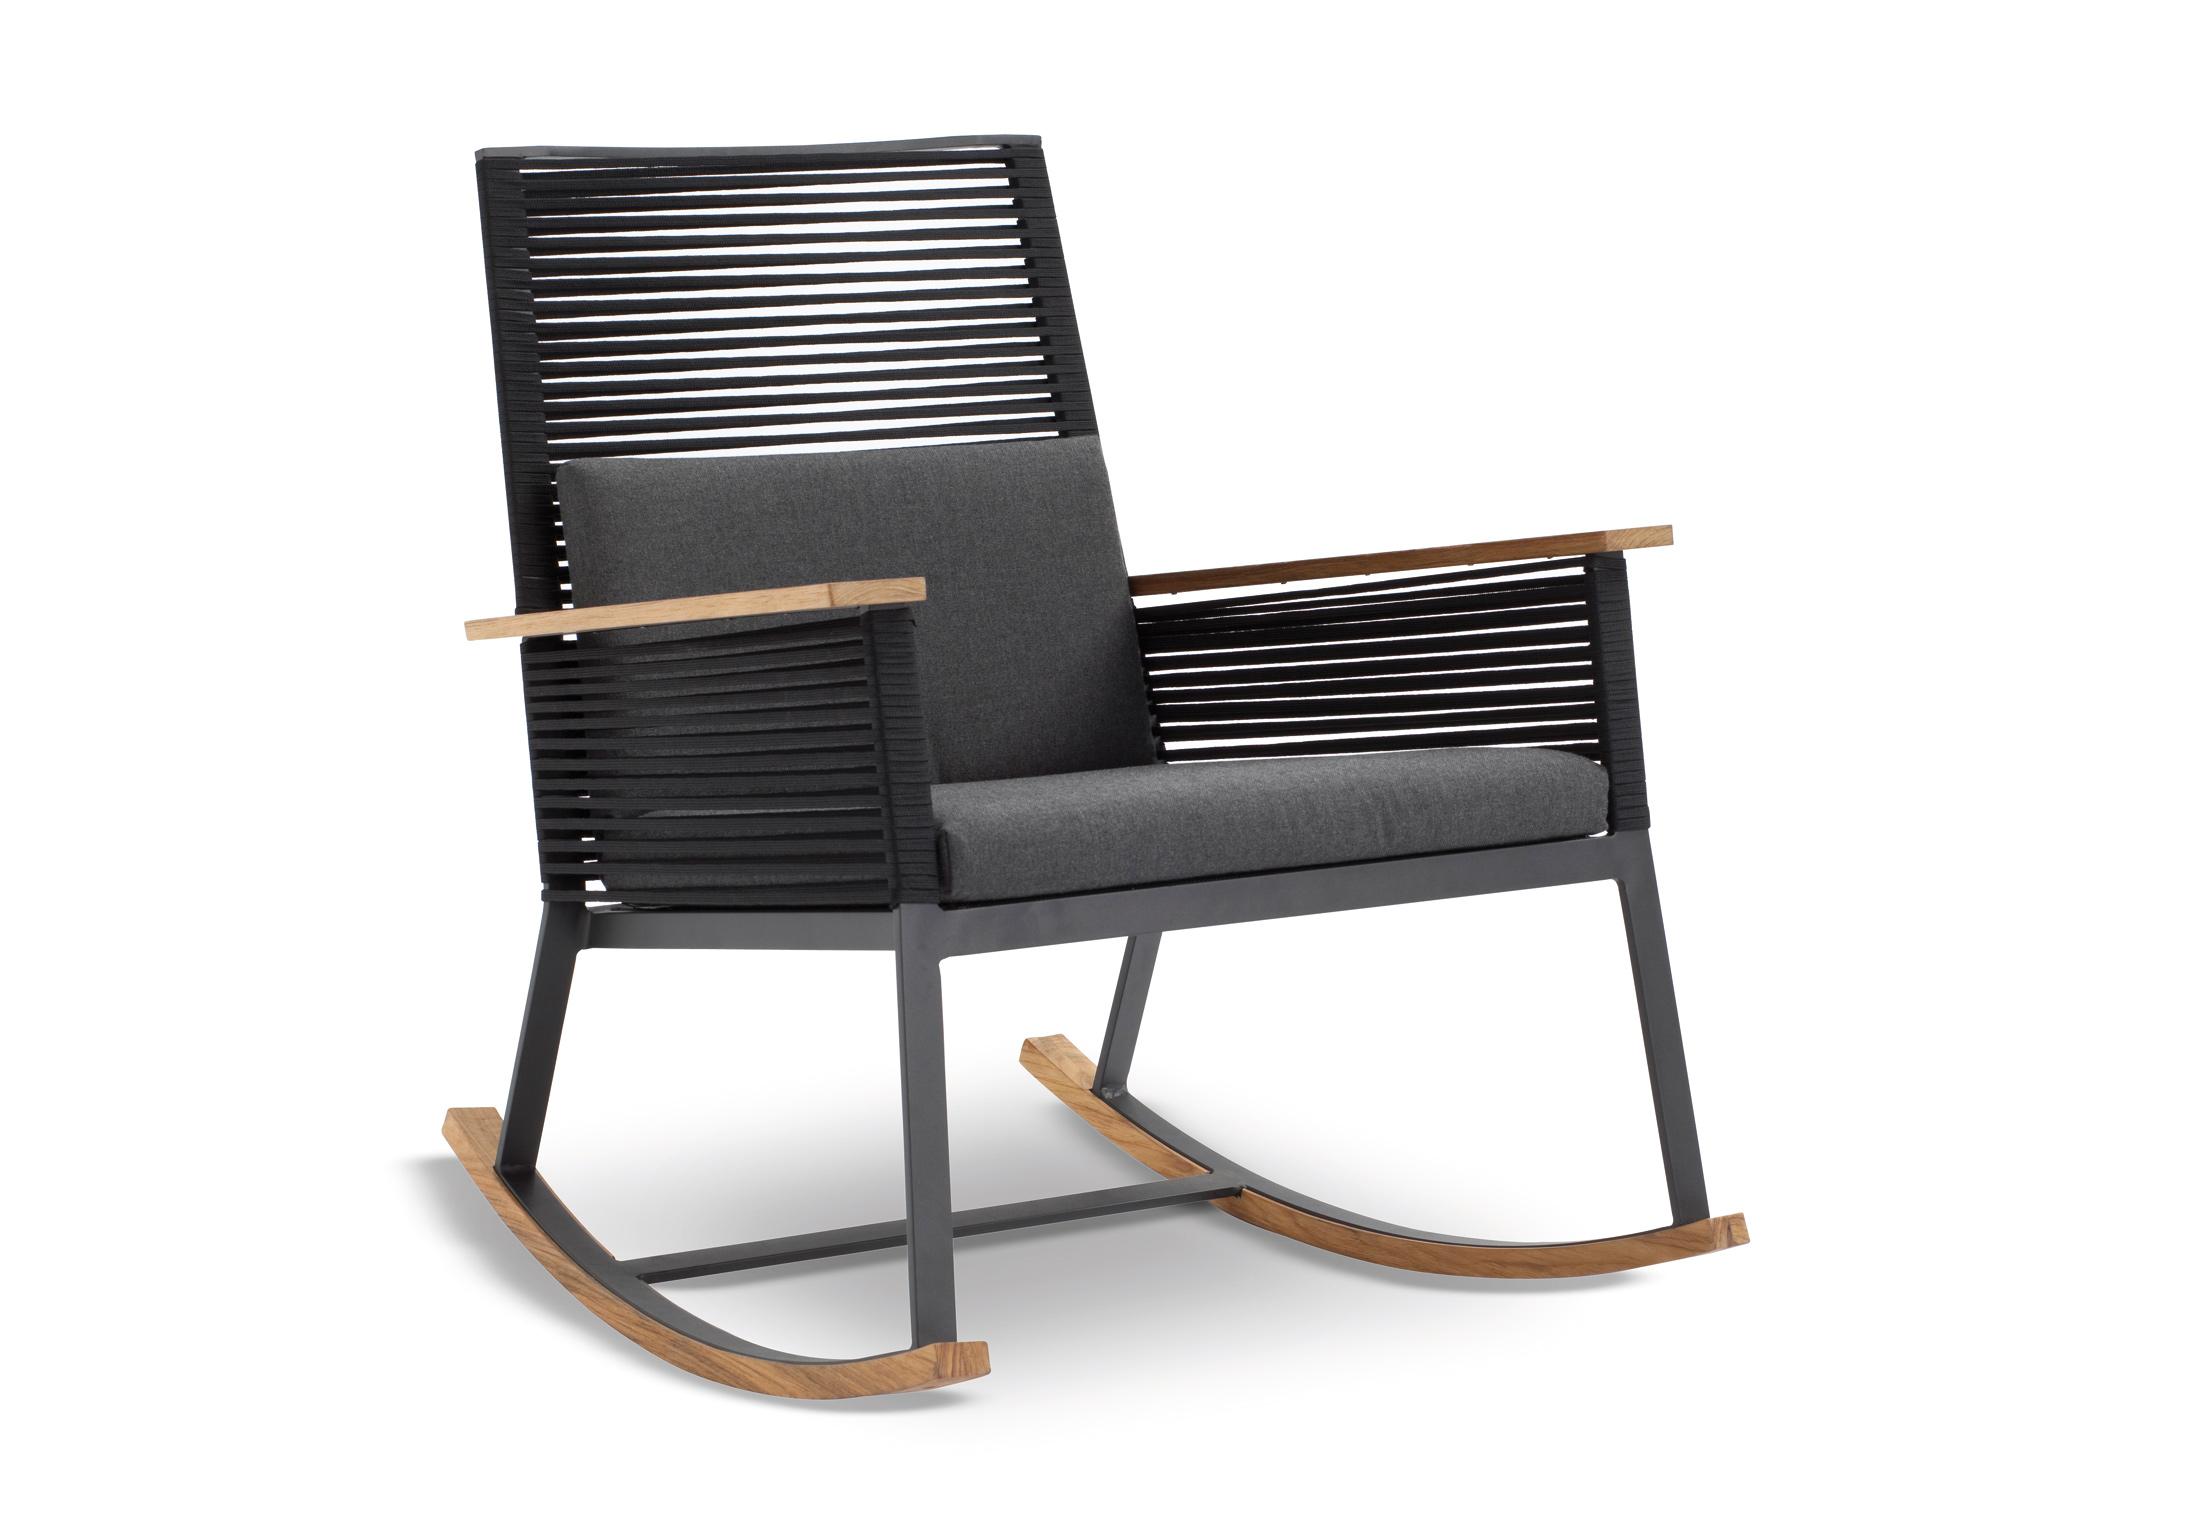 Landscape Rocking chair by Kettal